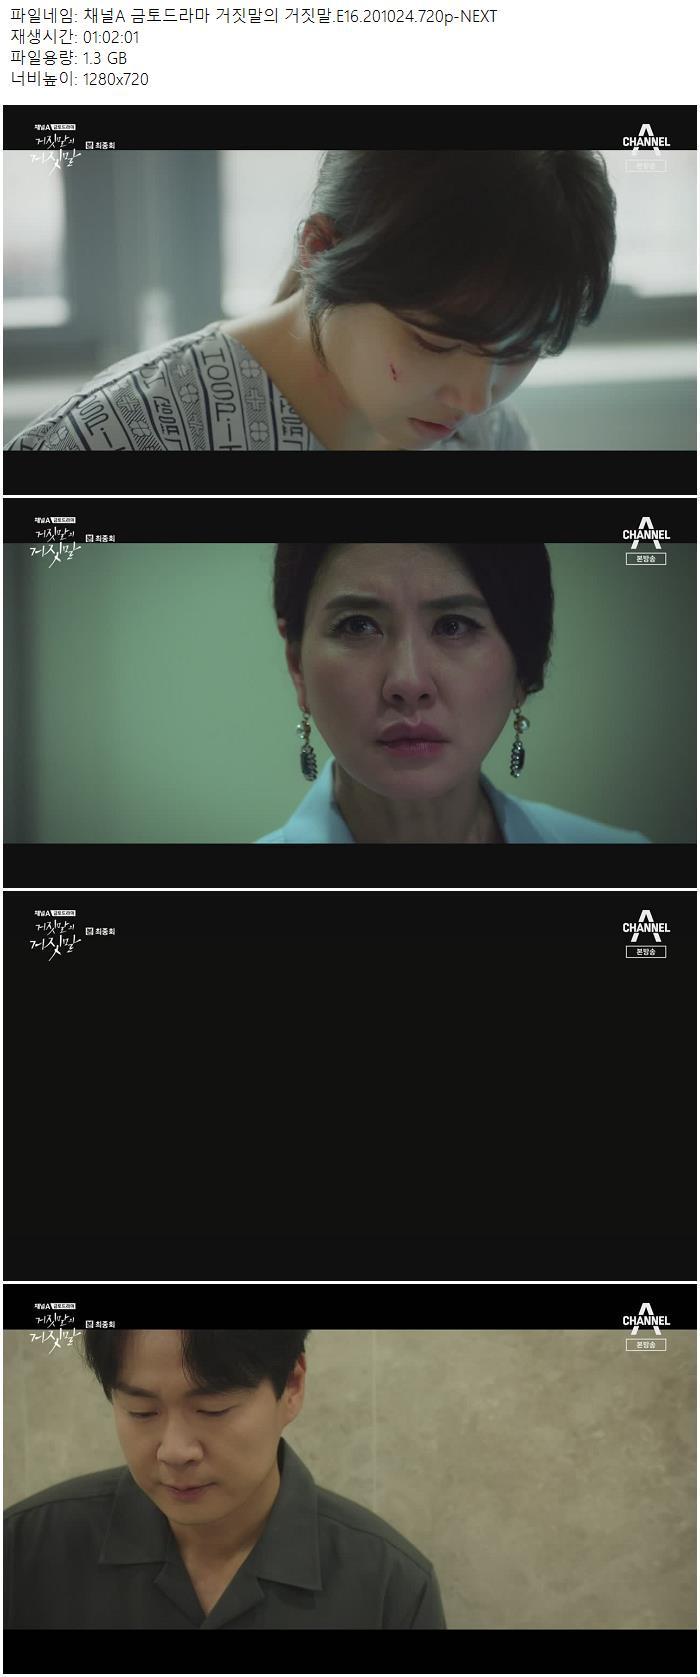 <b>채널A 금토드라마 거짓말의 거짓말.E16.201024.720p-NEXT</b>